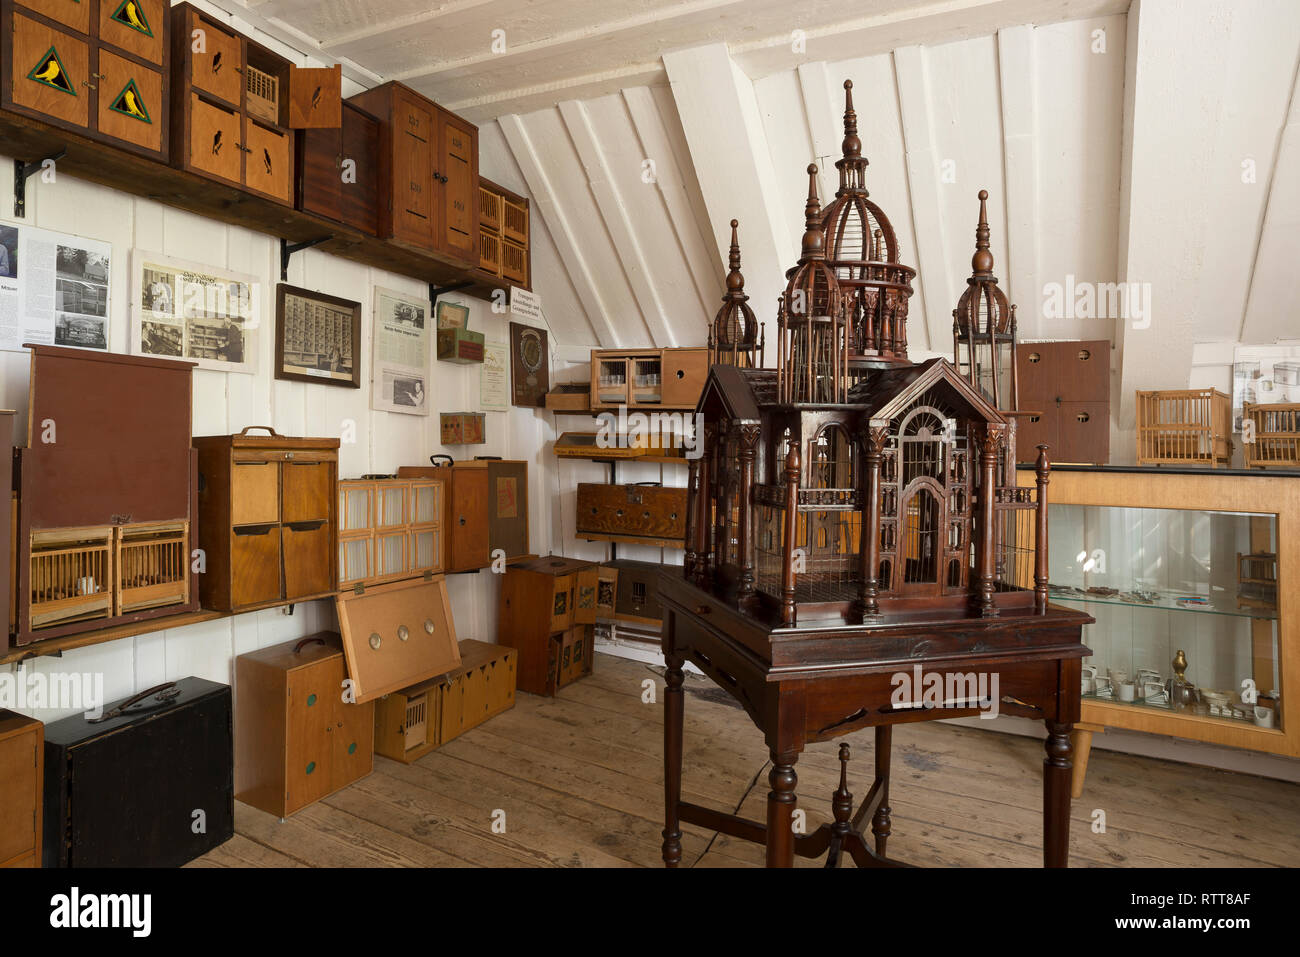 Grube Samson Bergwerksmuseum, Harzer Roller Museum, Sankt Andreasberg, Harz, Niedersachsen, Deutschland Stockbild